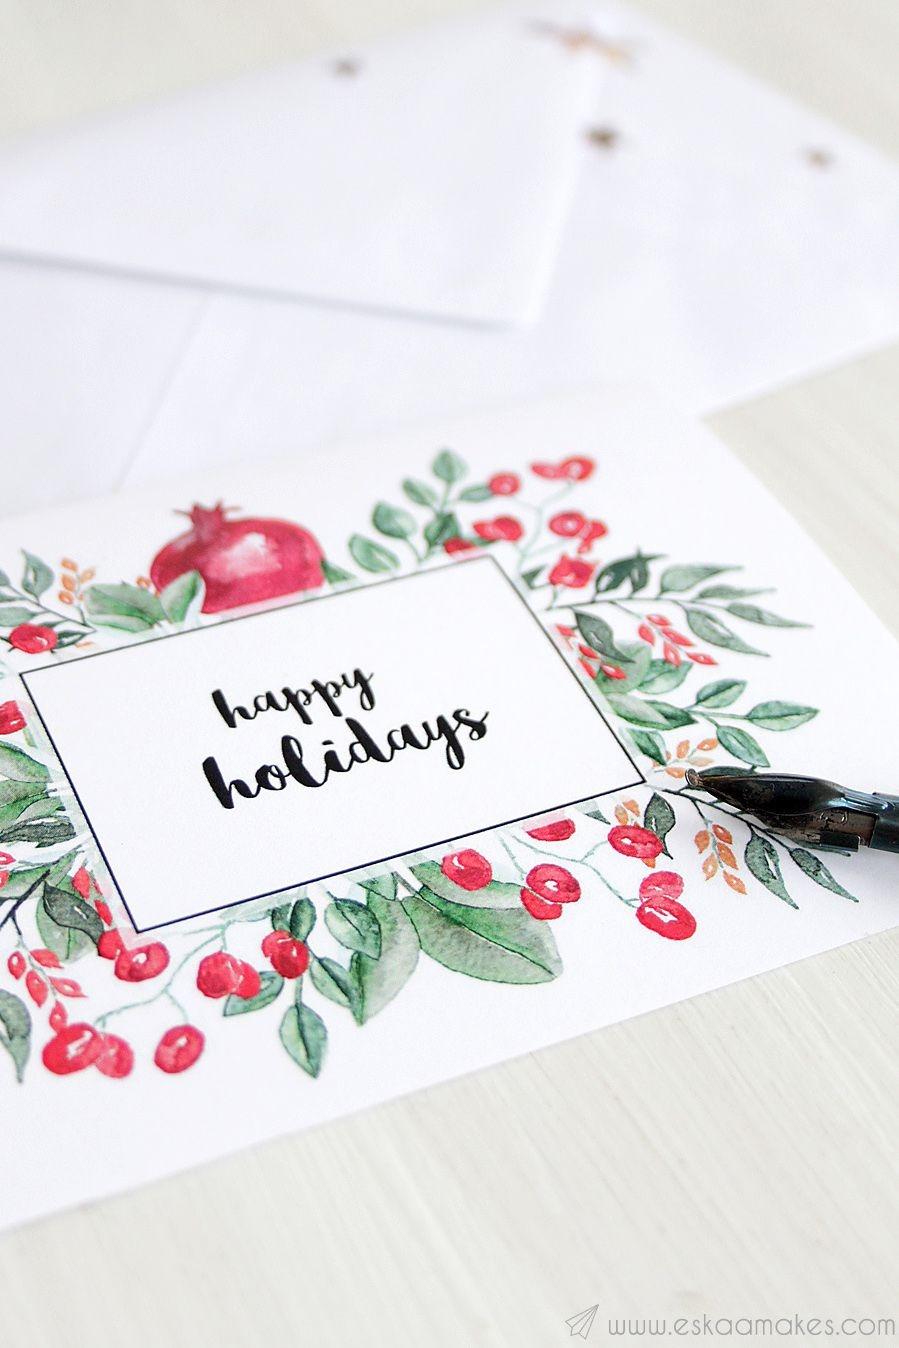 20 Diy Christmas Card Ideas - Easy Homemade Christmas Cards We're - Make A Holiday Card For Free Printable